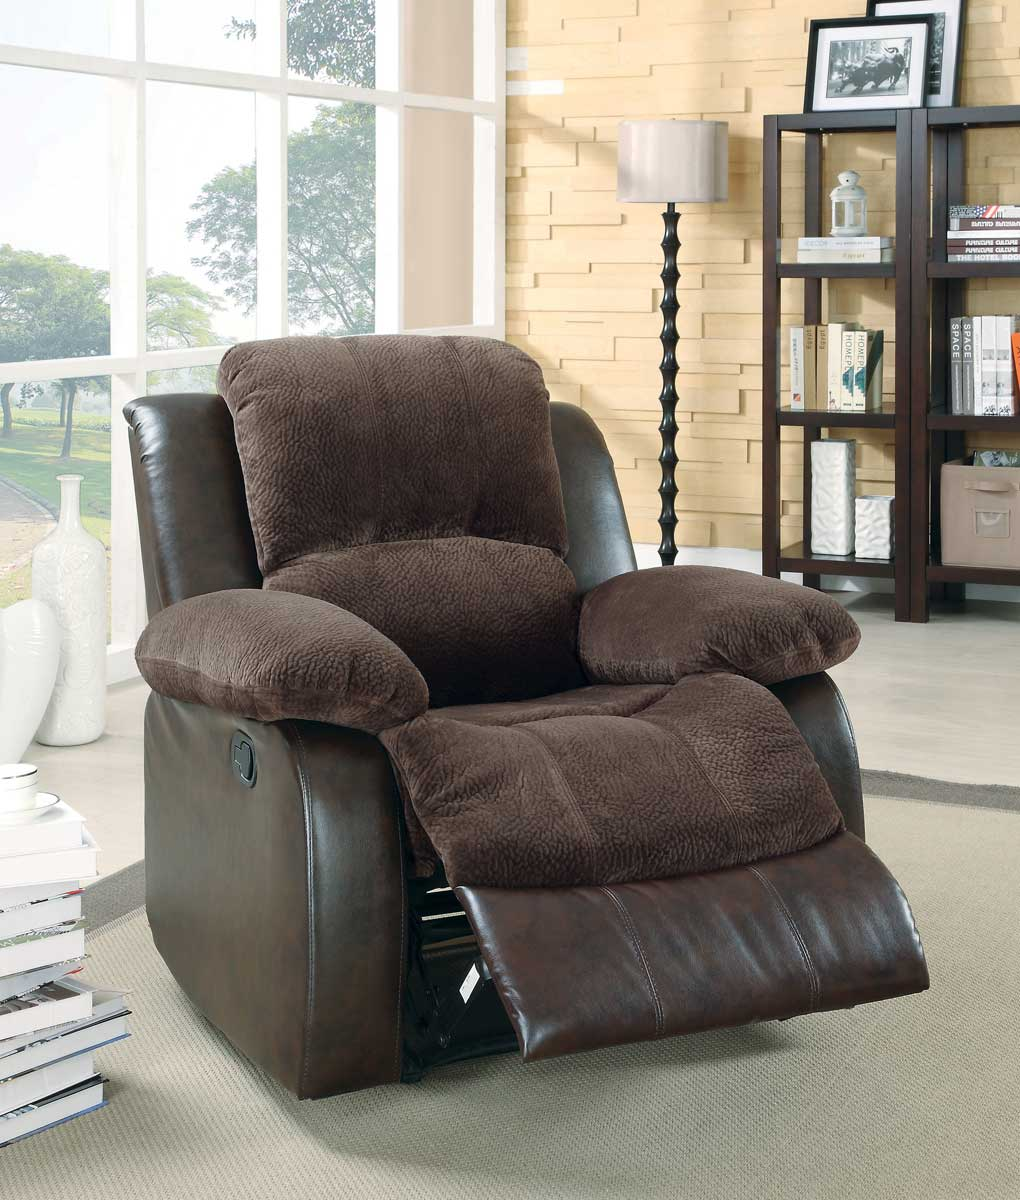 Homelegance Cranley Reclining Chair - Chocolate - Textured Plush Microfiber & Bi-Cast Vinyl